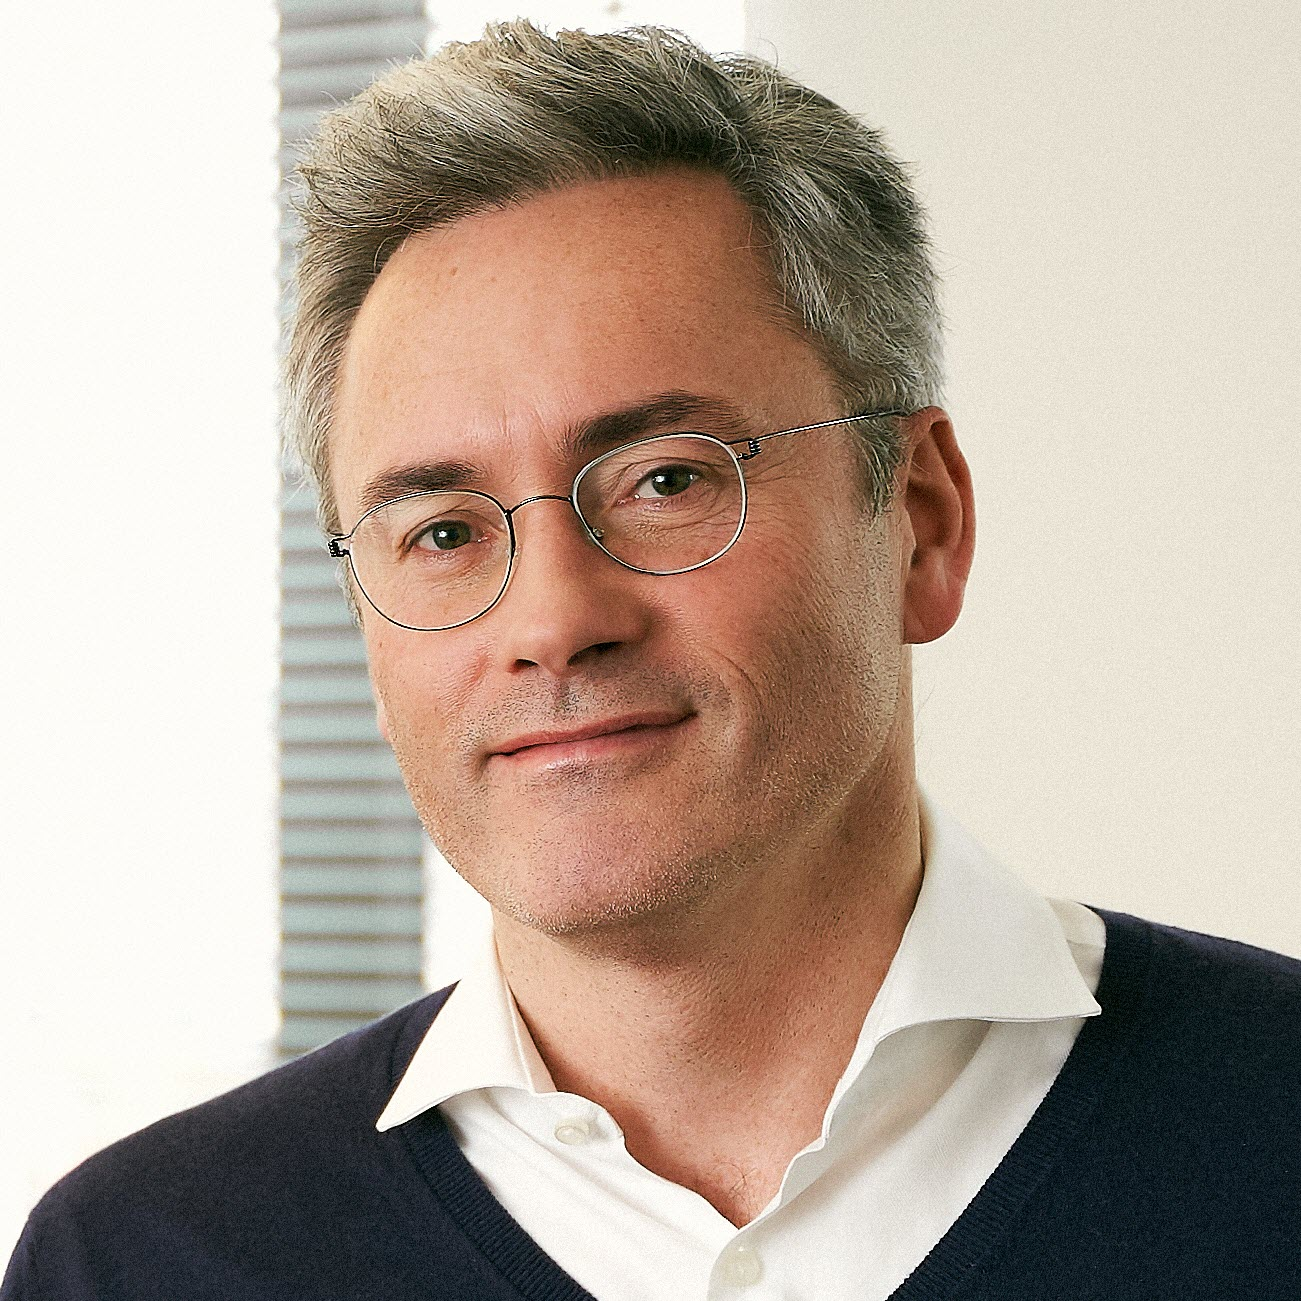 Rotonda manager lounge: Brille24 Geschäftsführer Christophe Hocquet: Von Tech zum Deep-Tech